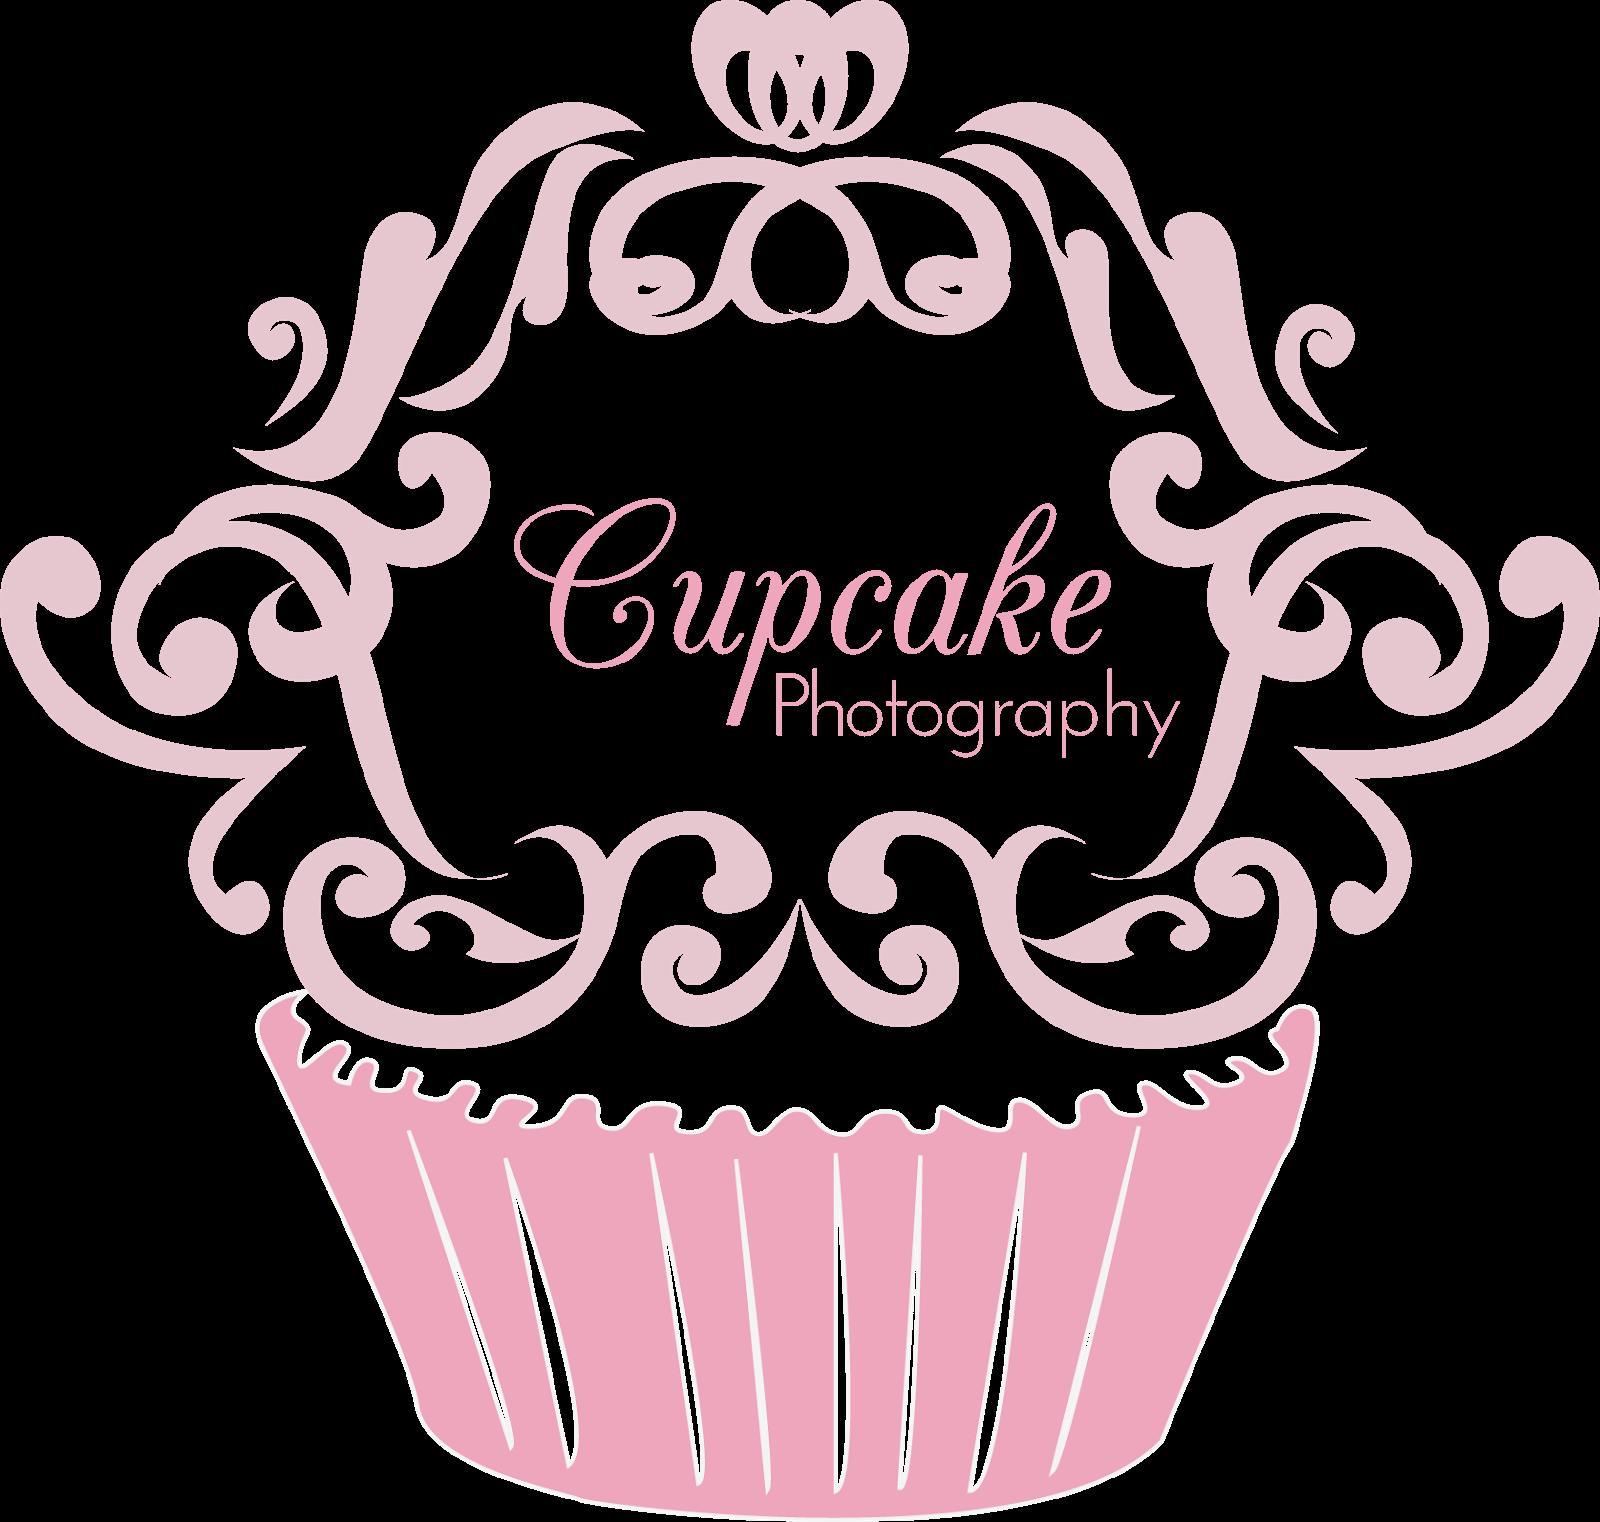 Help!! Need cupcake/cake logo design | Free Website Templates